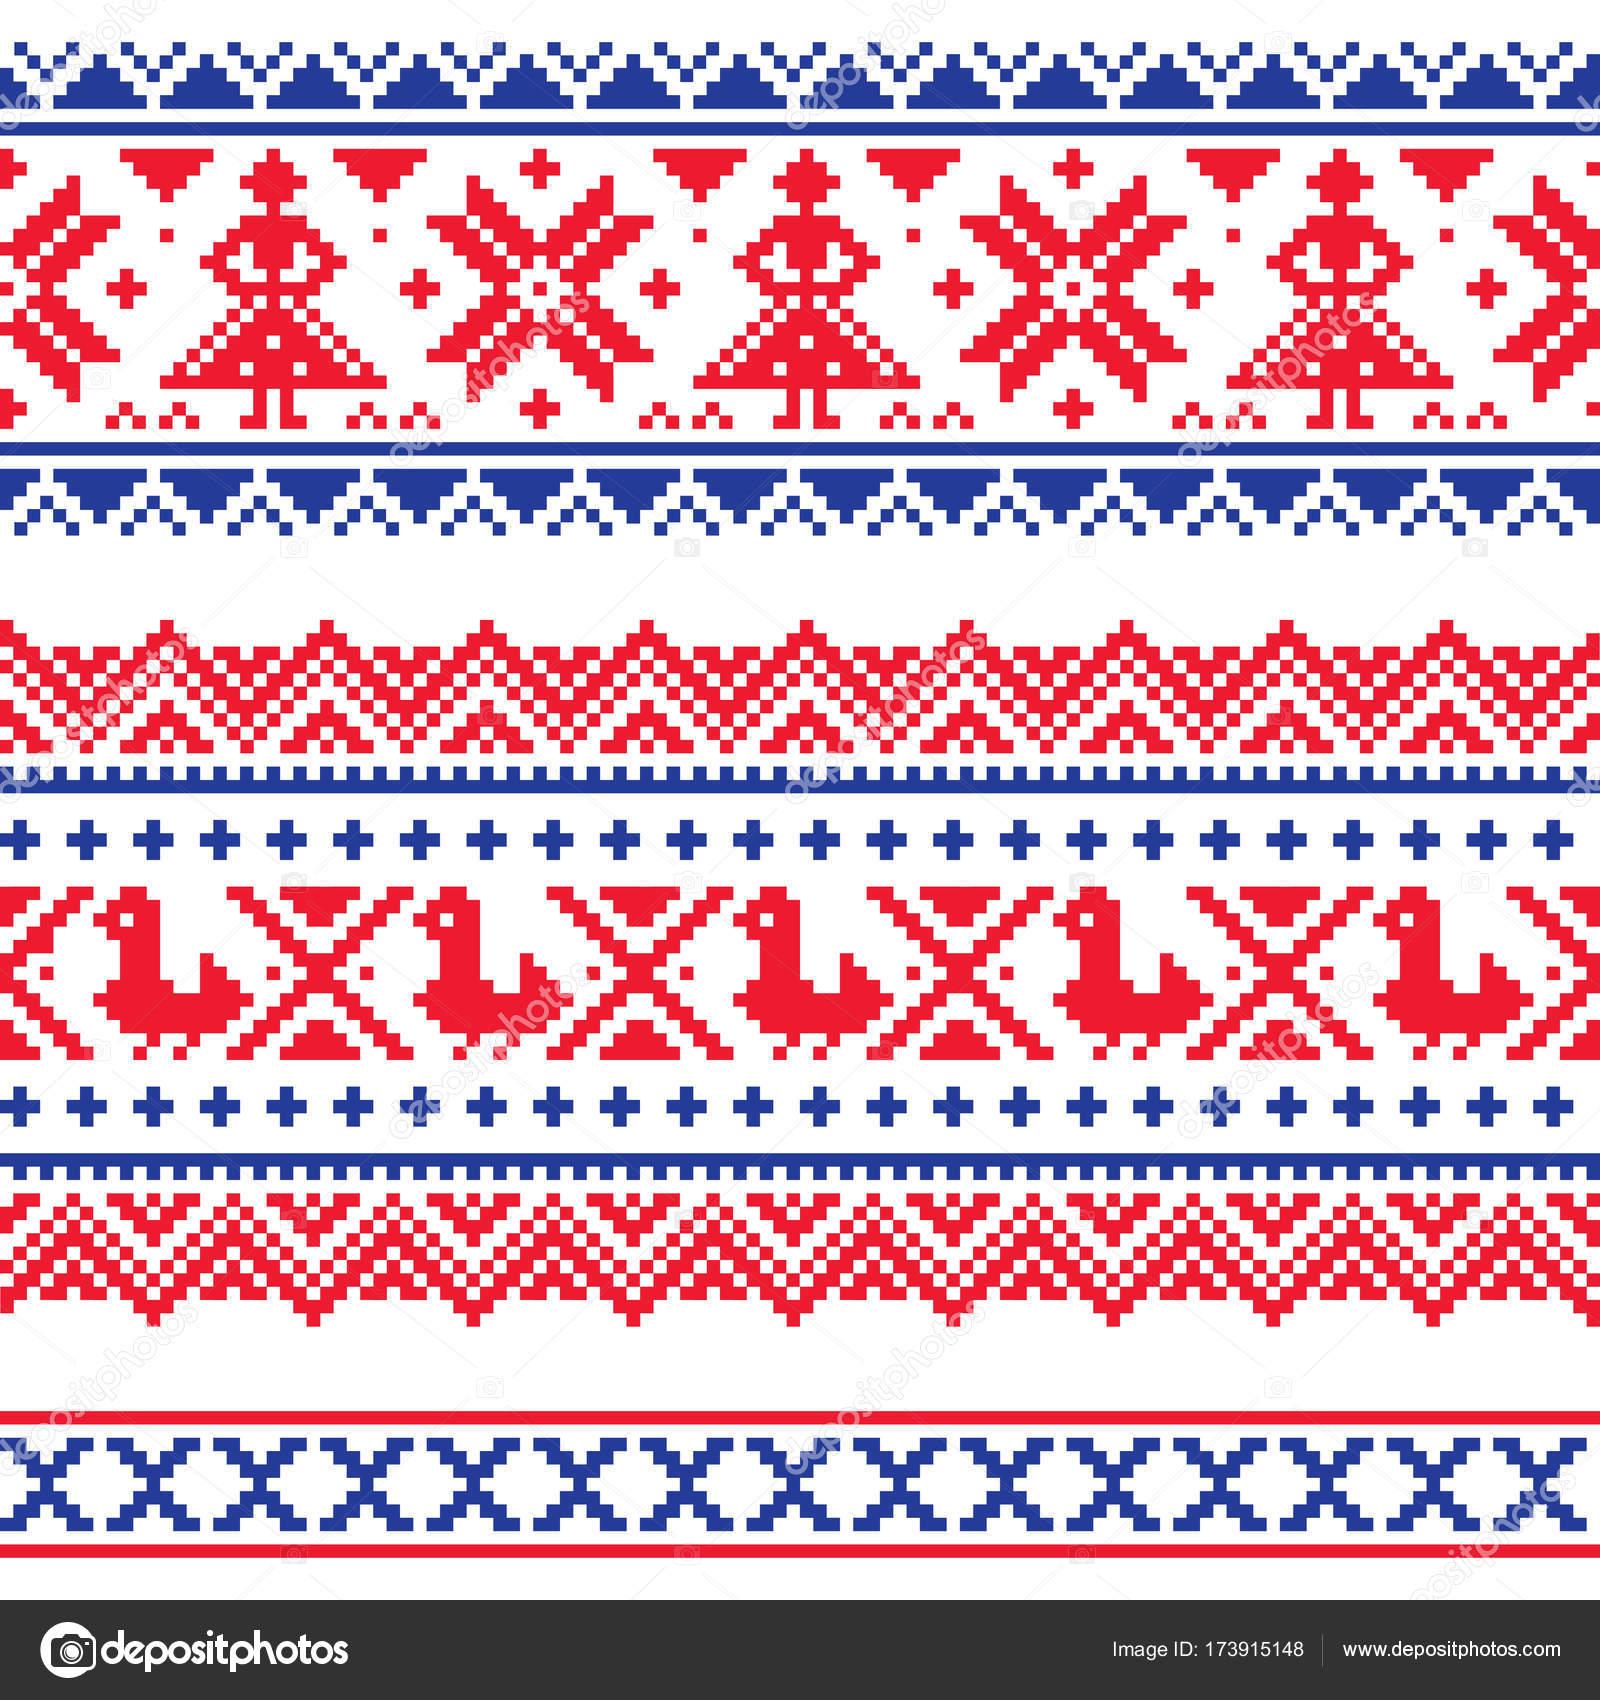 Diseño de Sami venda o belrd vector, Laponia punto de Cruz vector ...